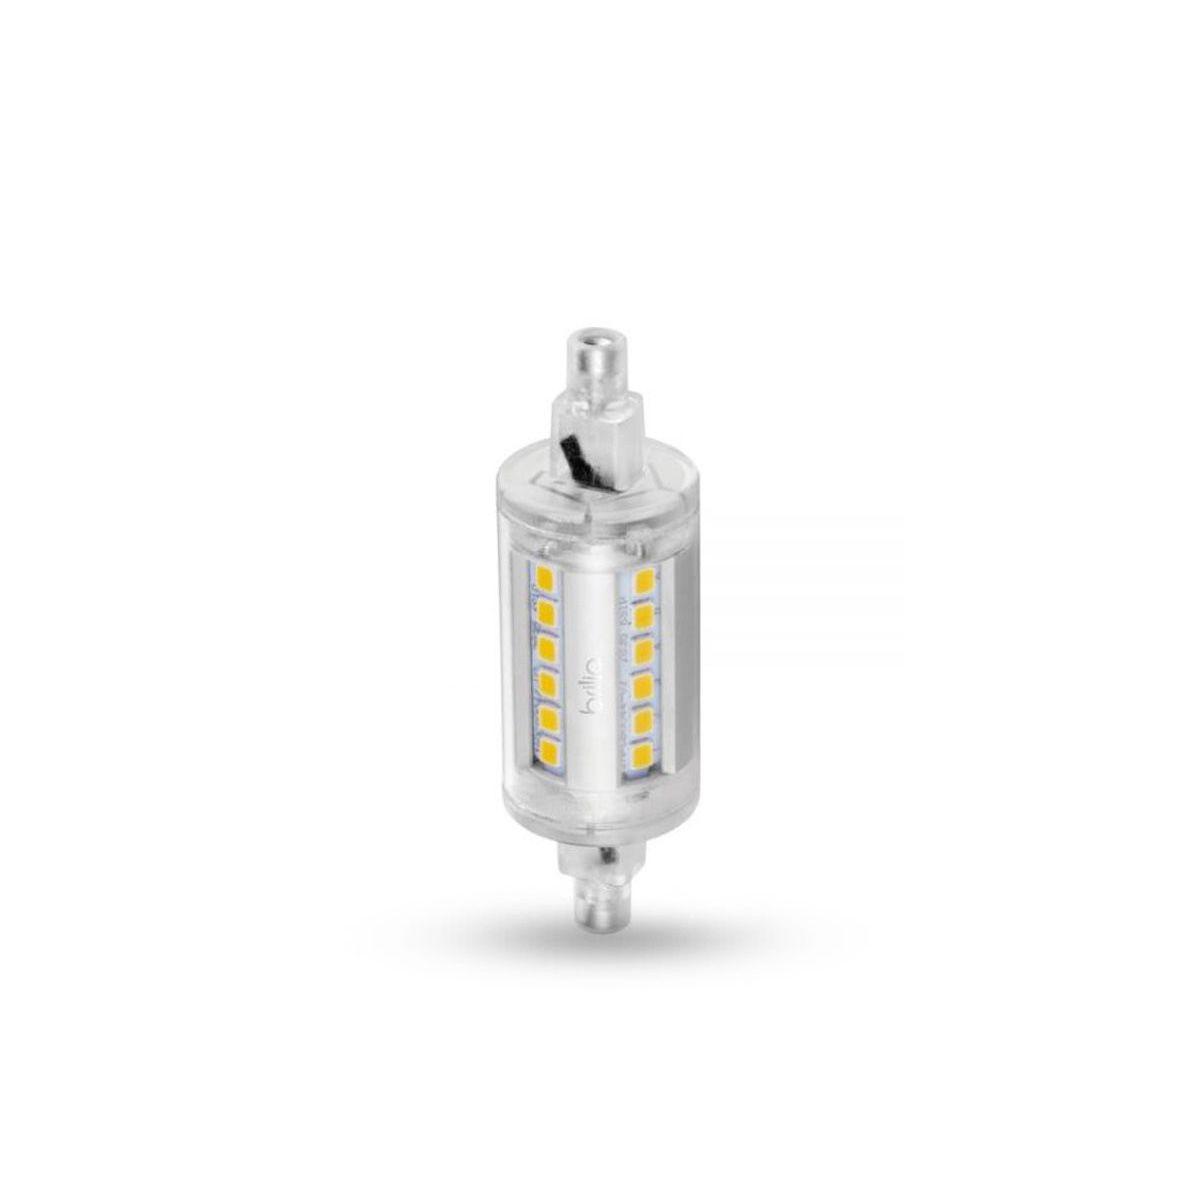 Lâmpada Led R7s 8W Branco Quente